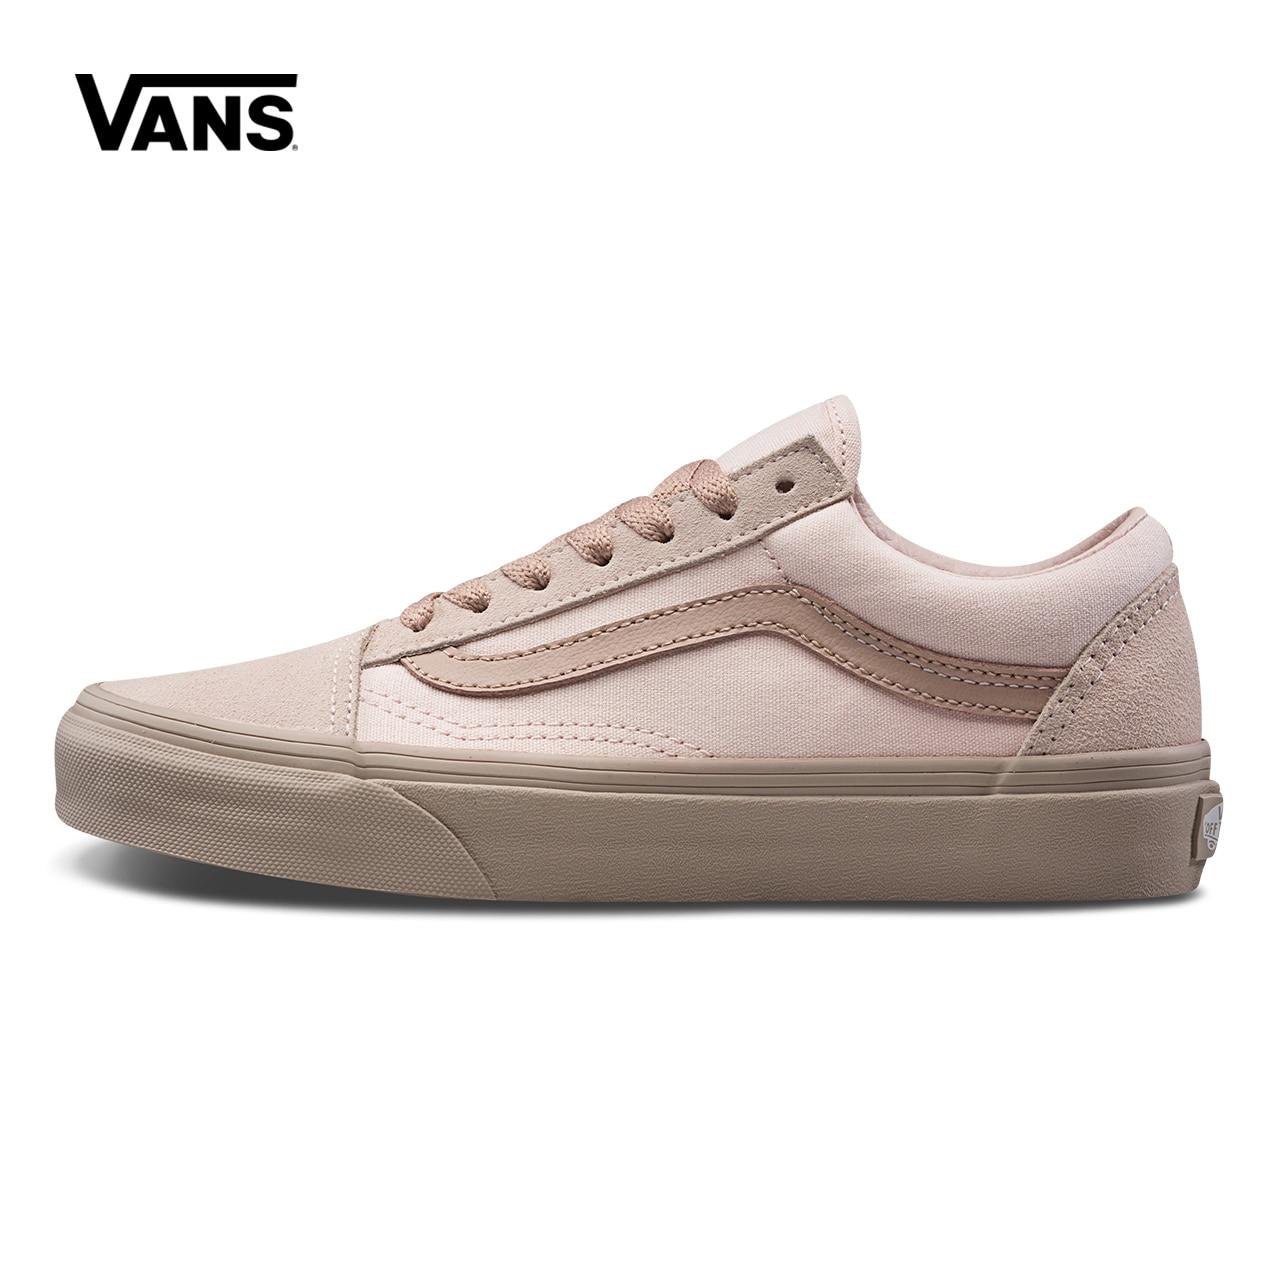 e90e08ffd62 Authentieke Vans Sneakers Dames Sport Skateboarden Schoenen Rubberen ...